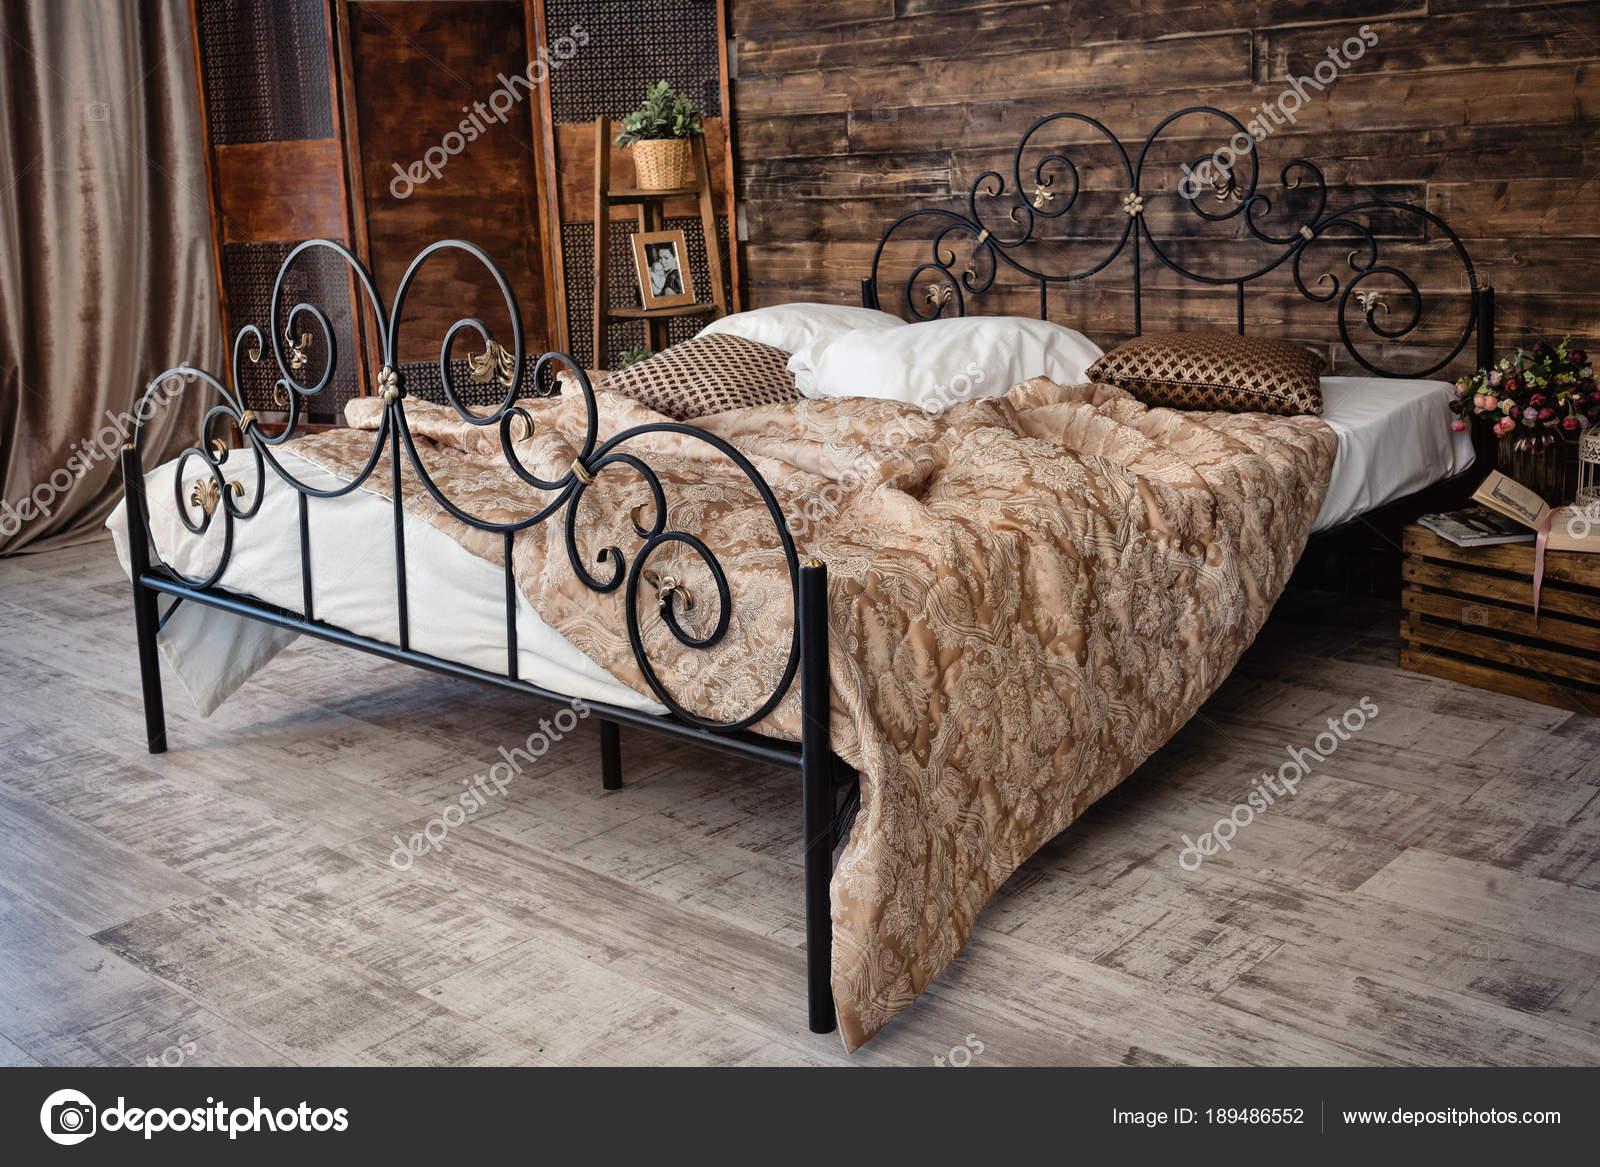 Schmiedeeisen Bett Stockfoto C Alfoto Bk Ru 189486552